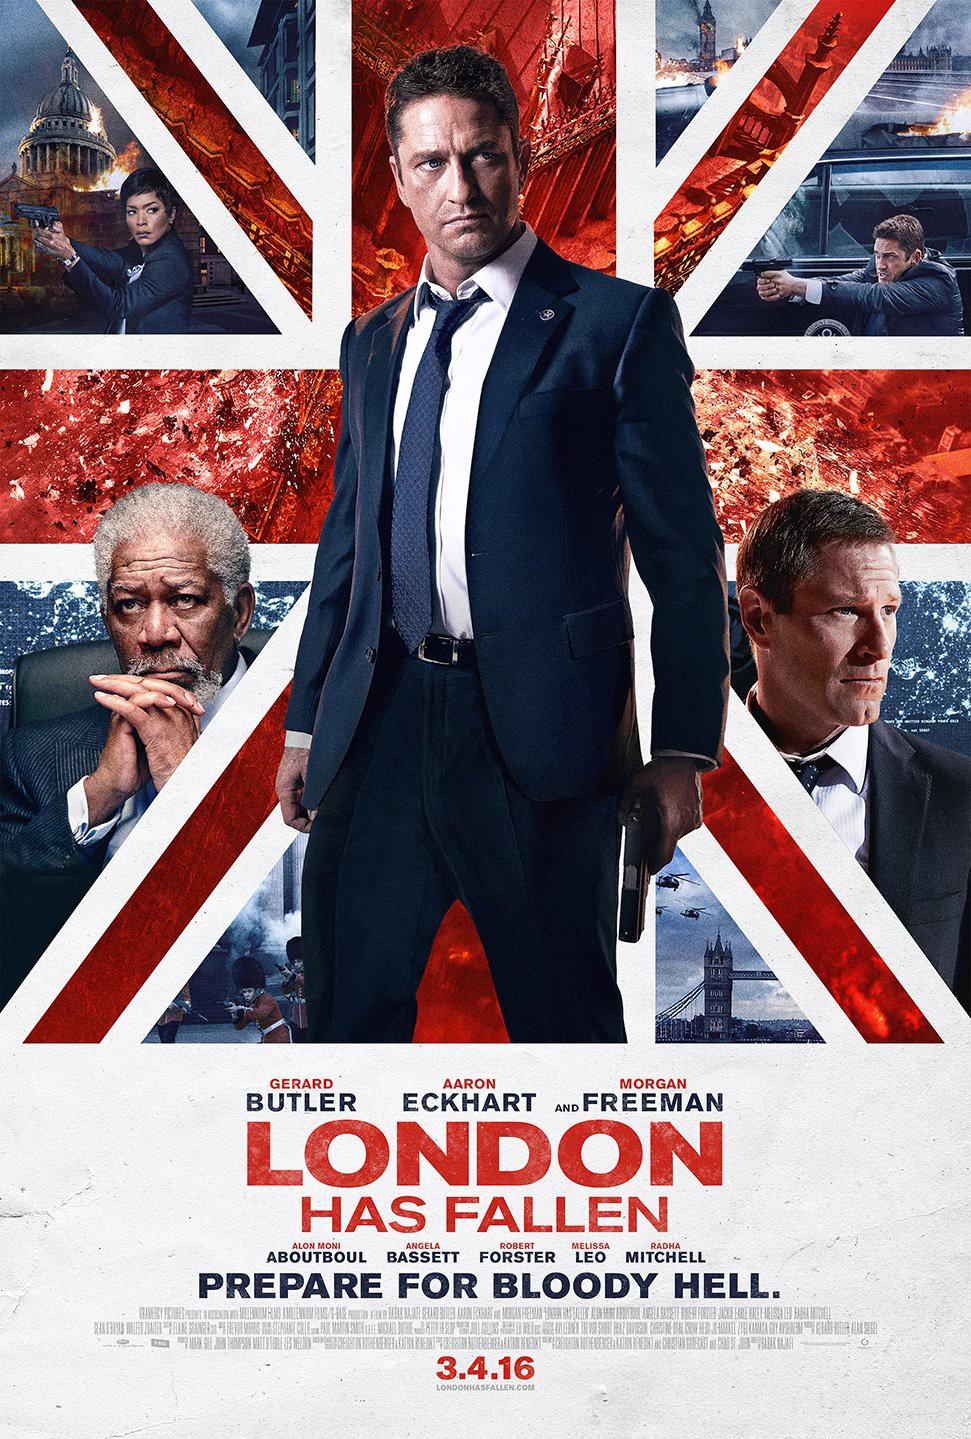 Póster de London Has Fallen (2016). Imagen: impawards.com